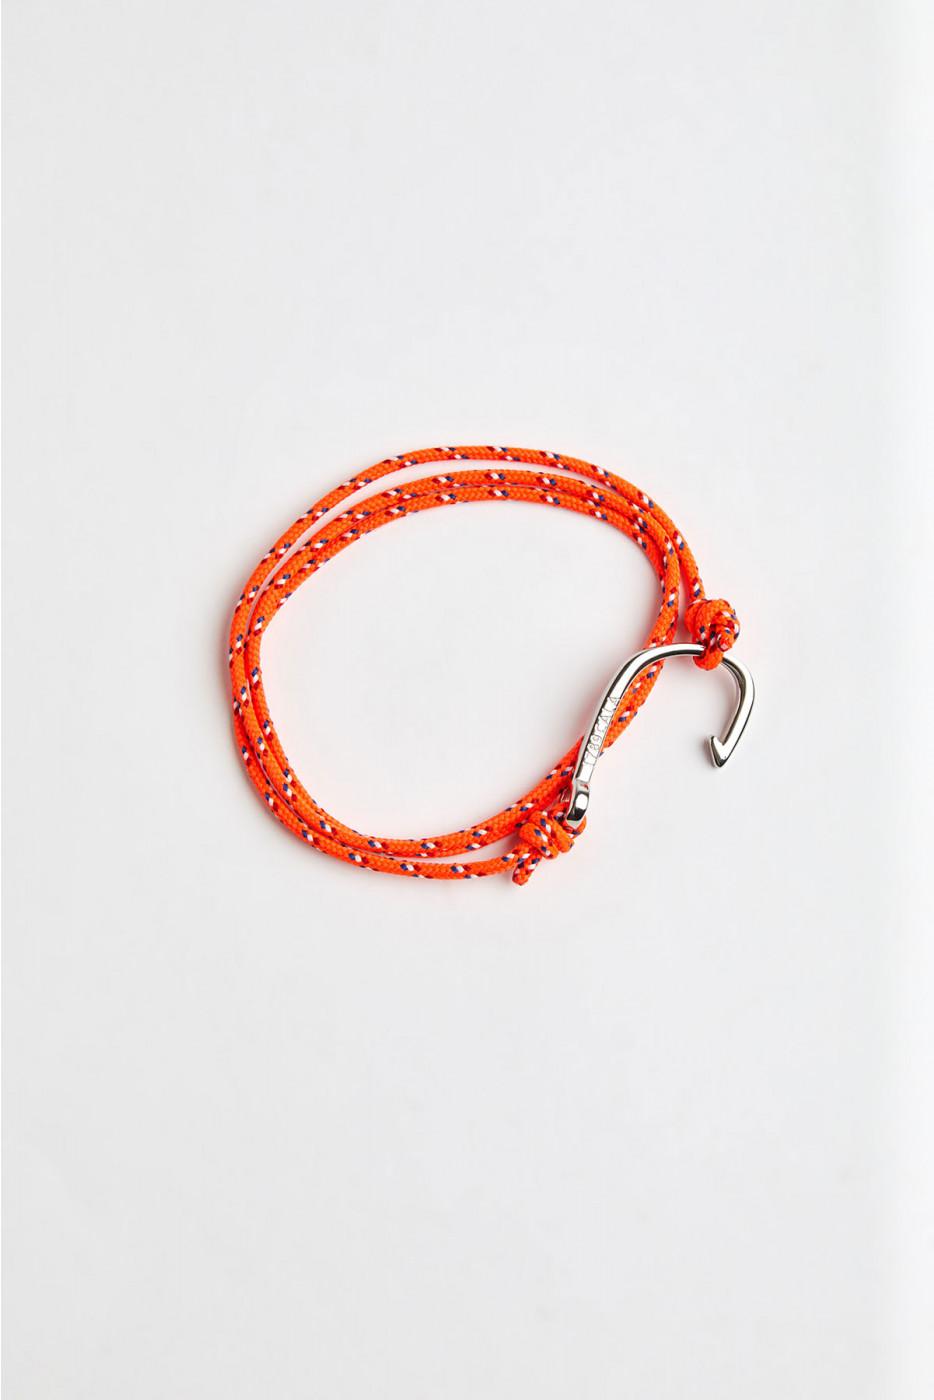 Bracelet Corde Fluo Orange - HAMEÇON BRACELET